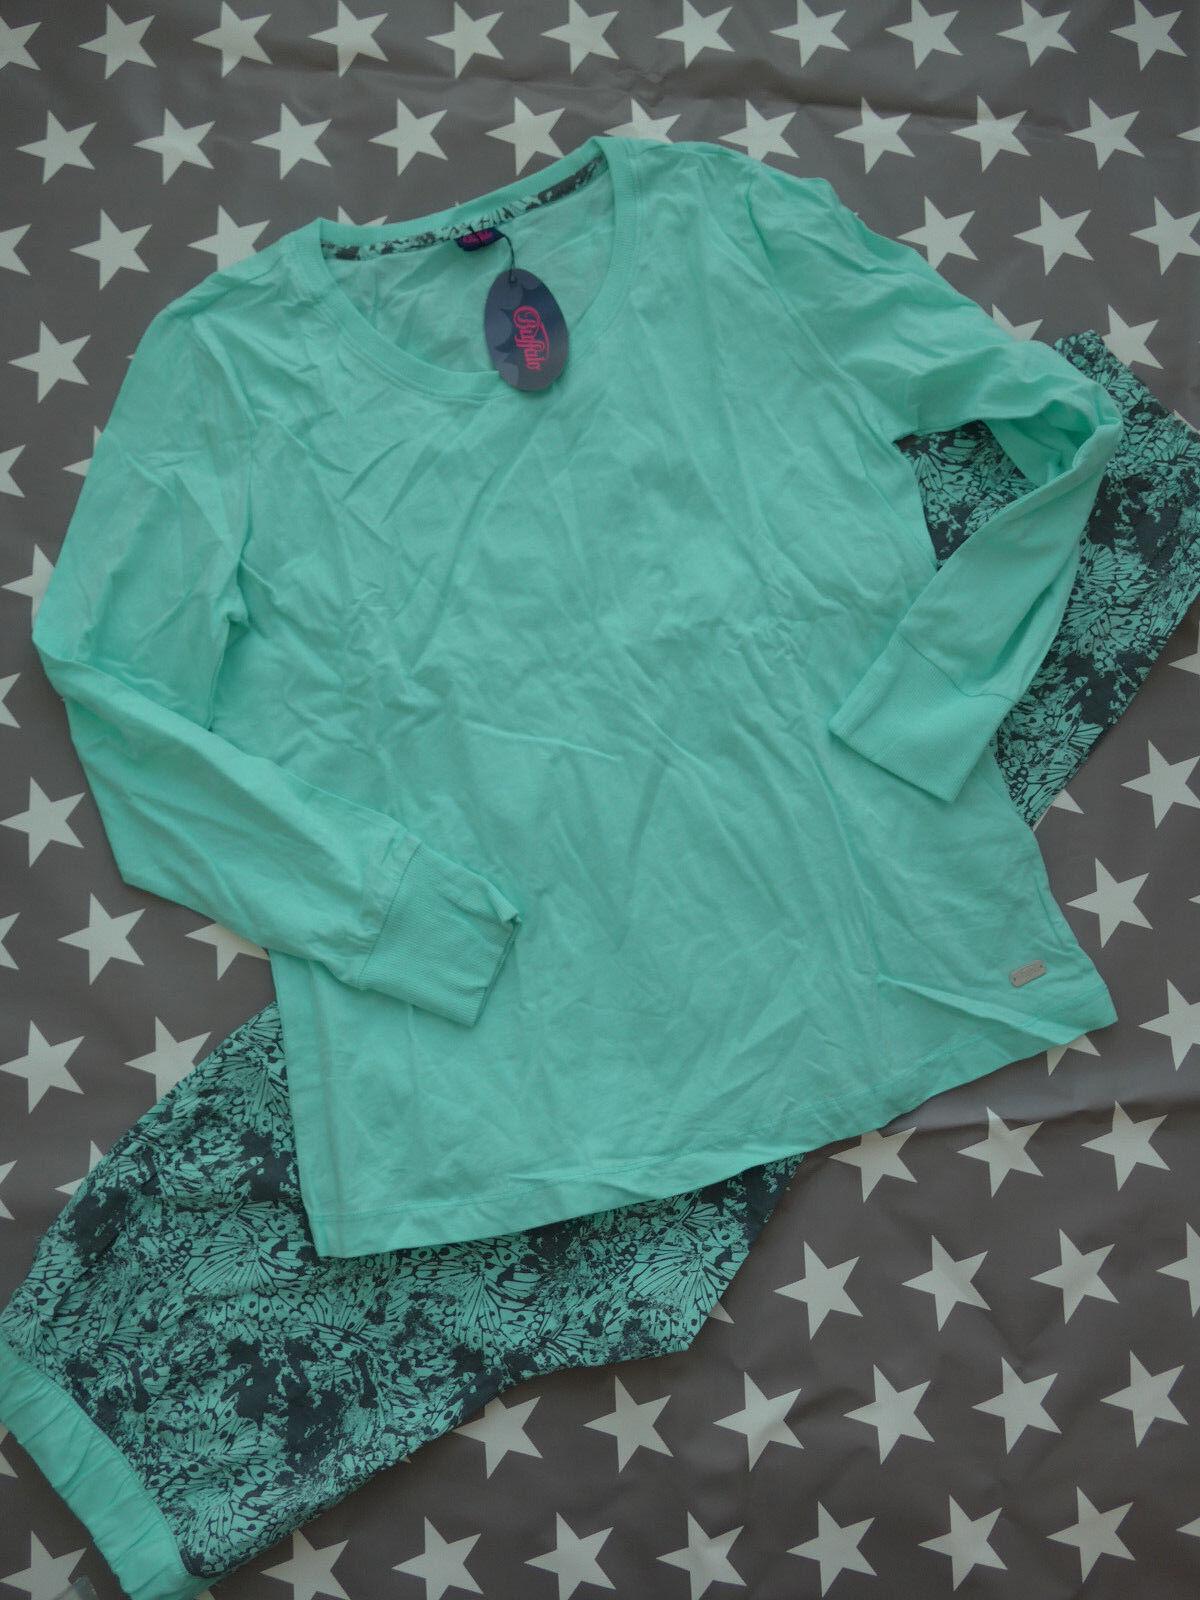 Buffalo Pyjamas Sleepshirt Size 44 46 NEW (937)